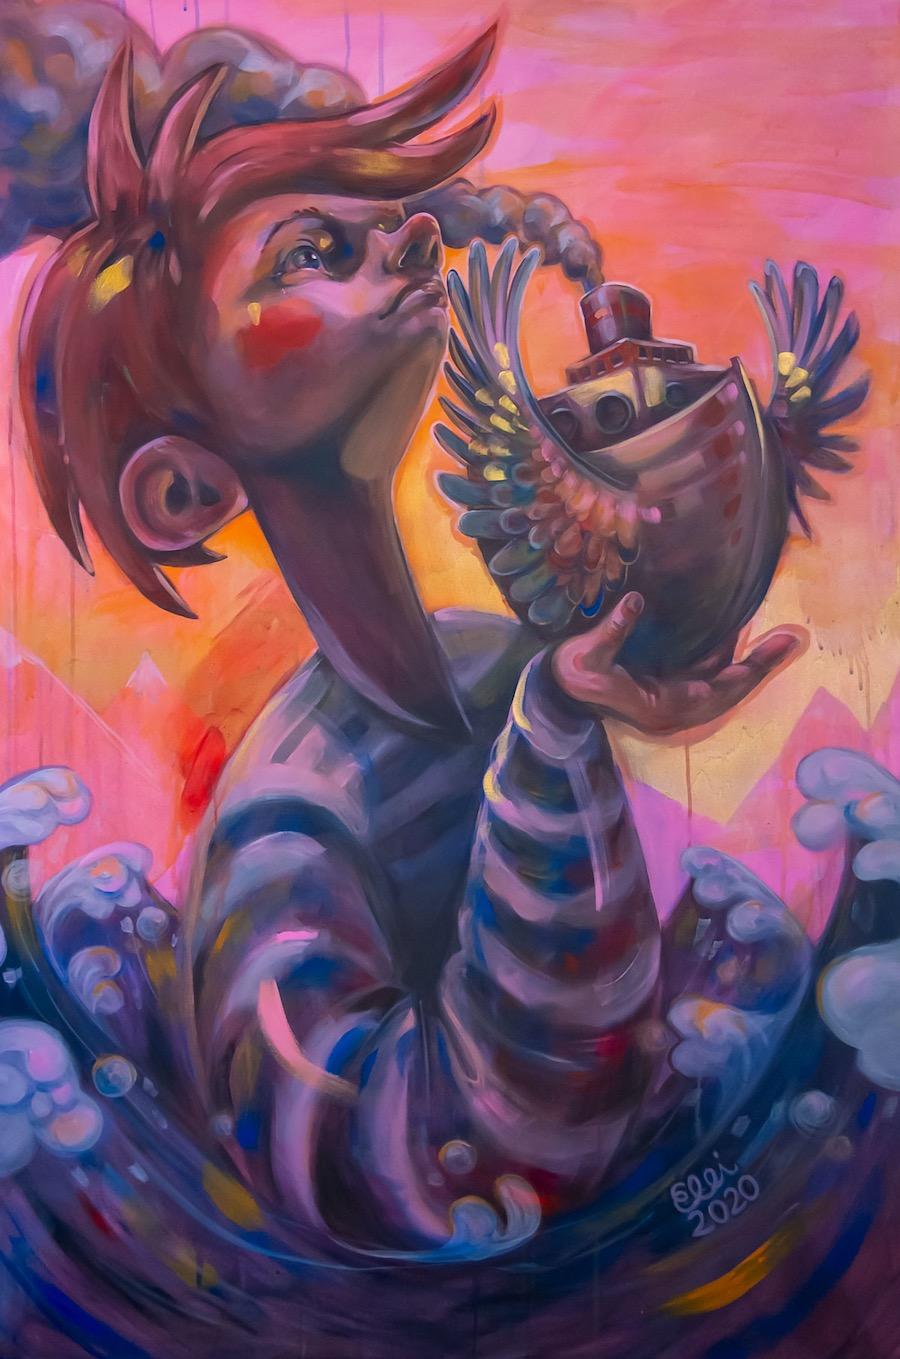 Elli Maanpää: Beyond the Horizon, Acrylic paint on recycled canvas, 100x150cm, 2020